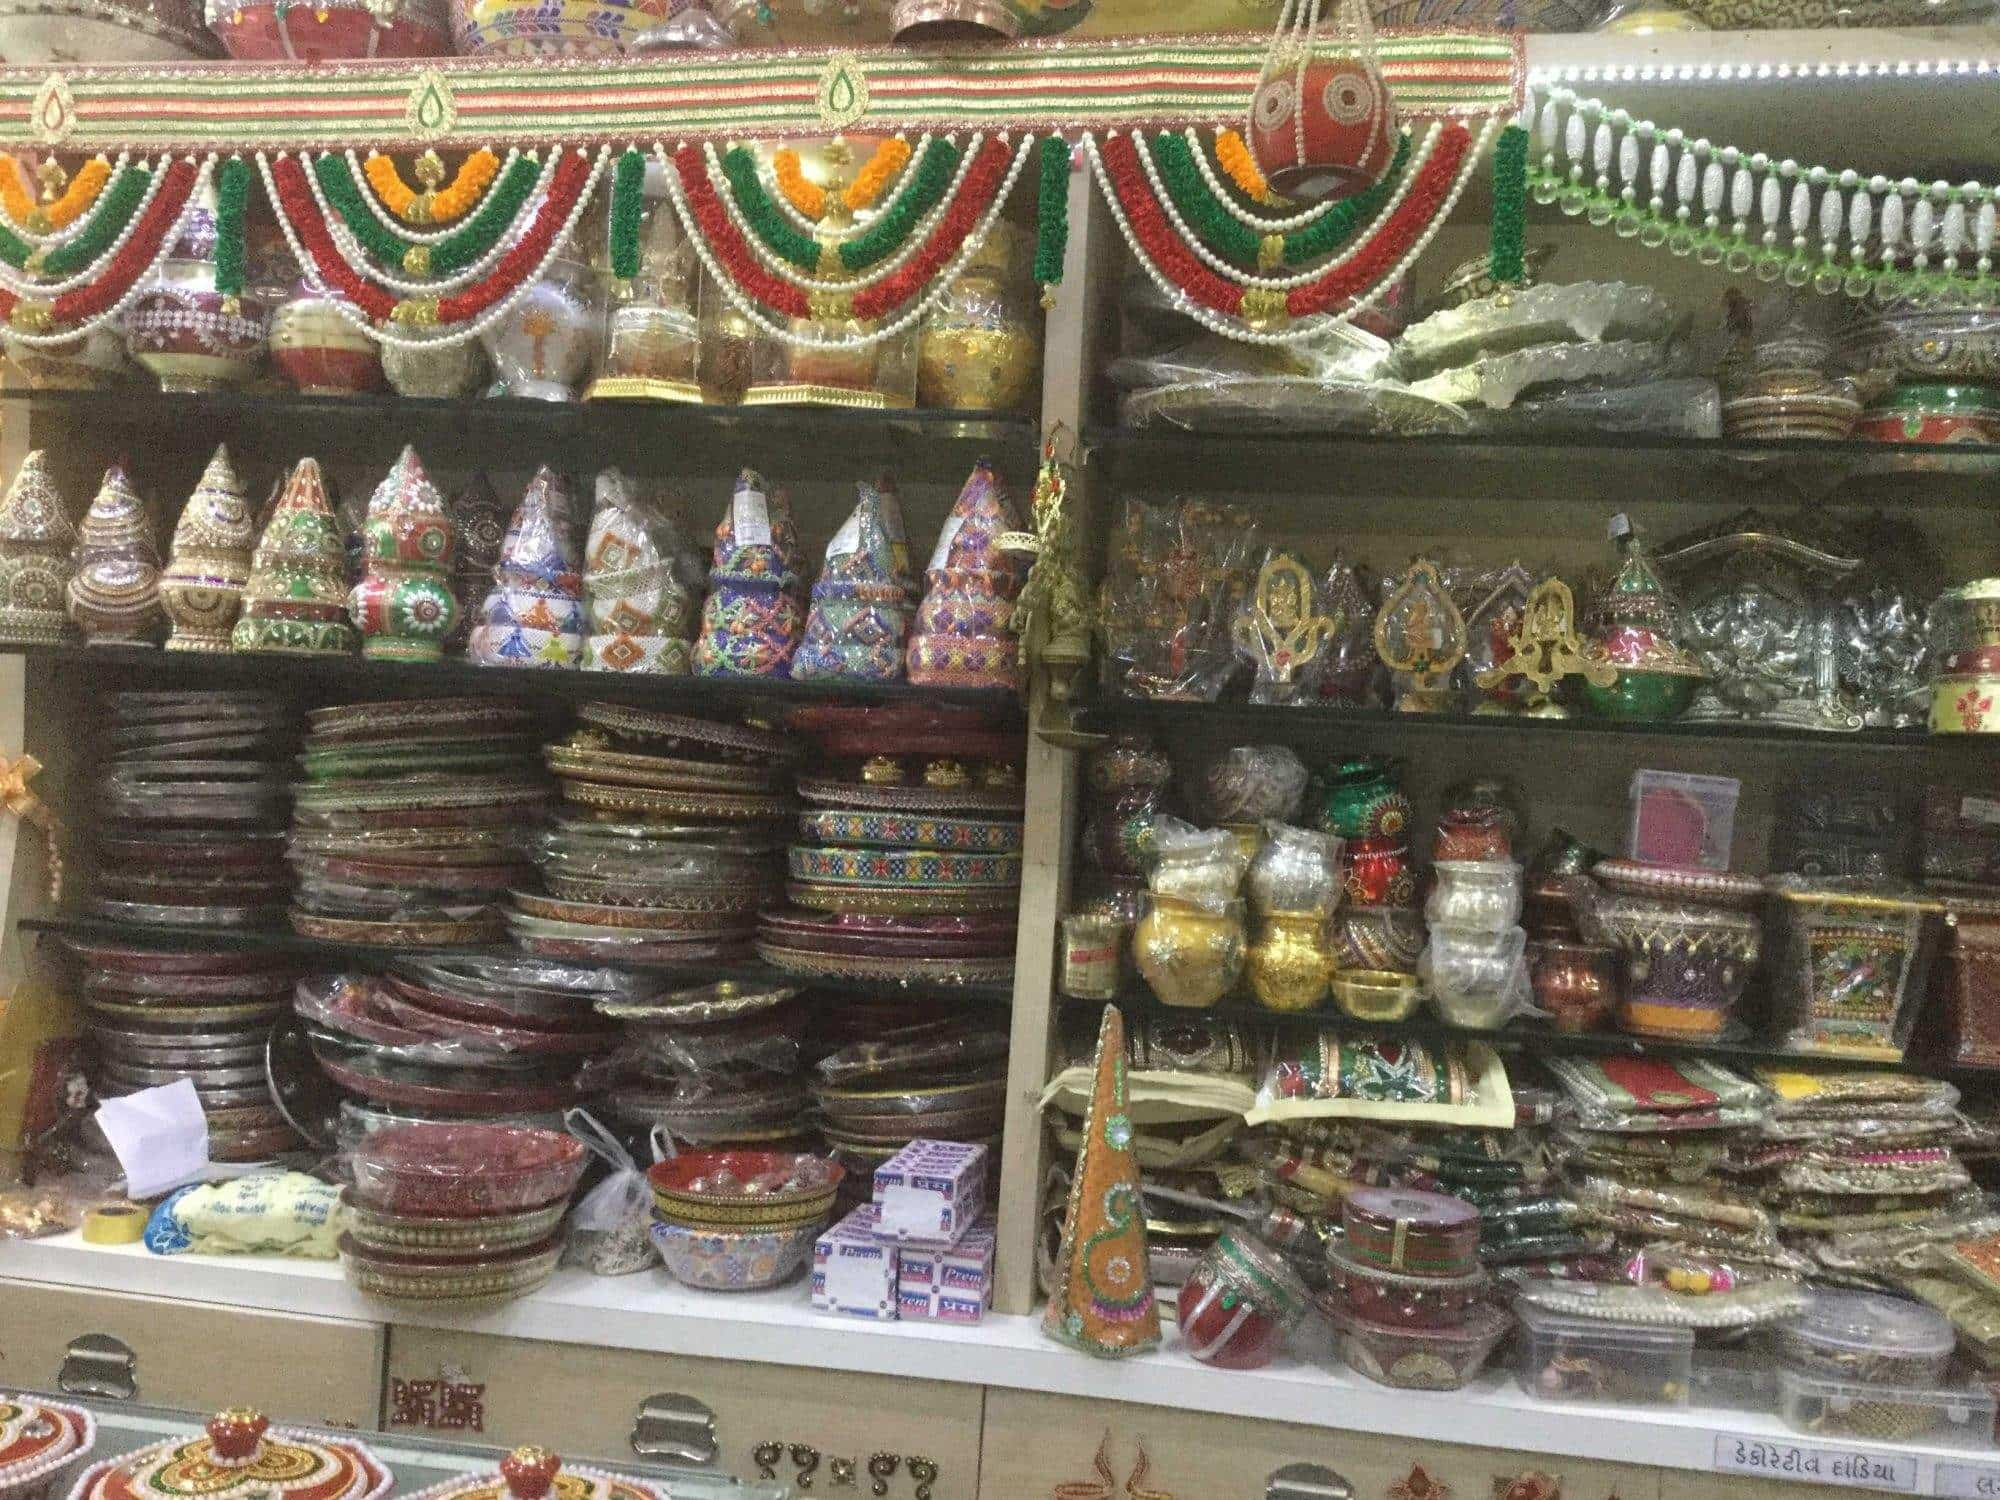 Top 100 Handicraft Item Dealers In Ahmedabad Best Handicraft Item